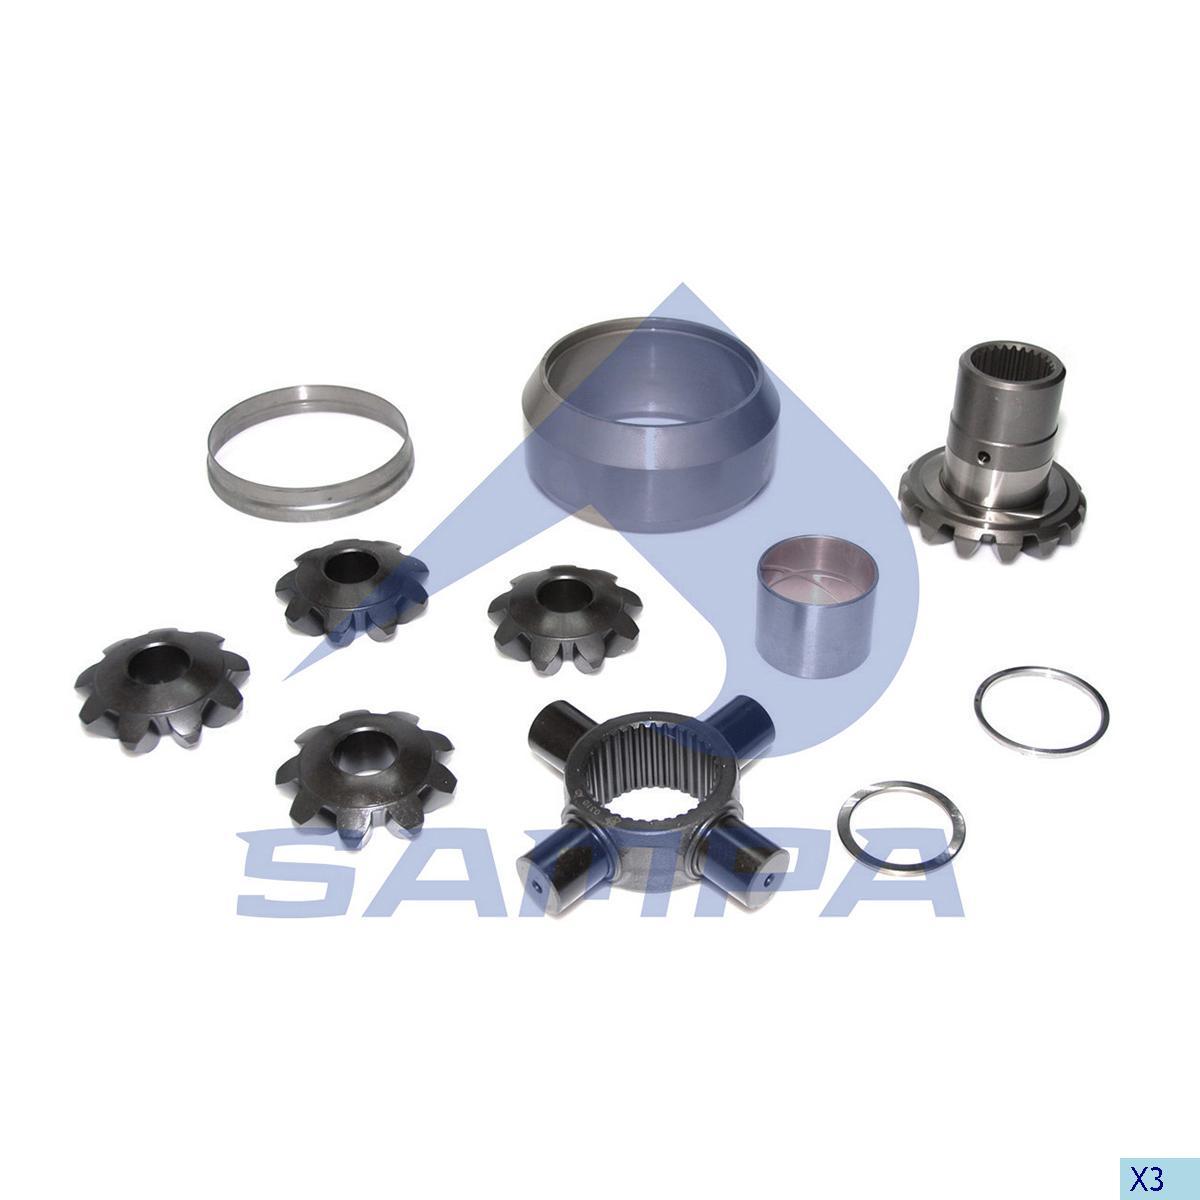 Repair Kit, Distribution Shaft, Mercedes, Power Unit